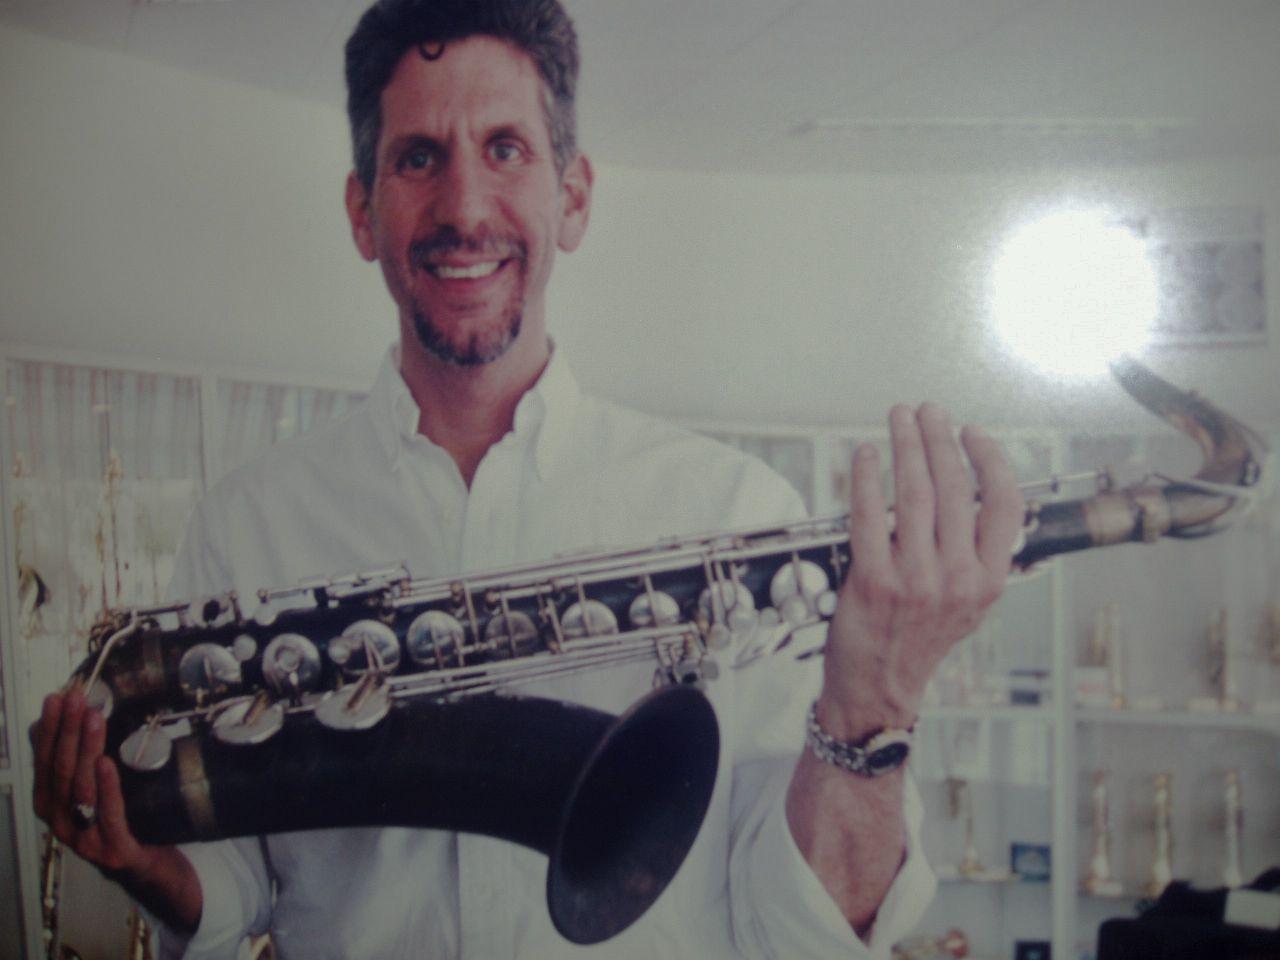 Musiker 007